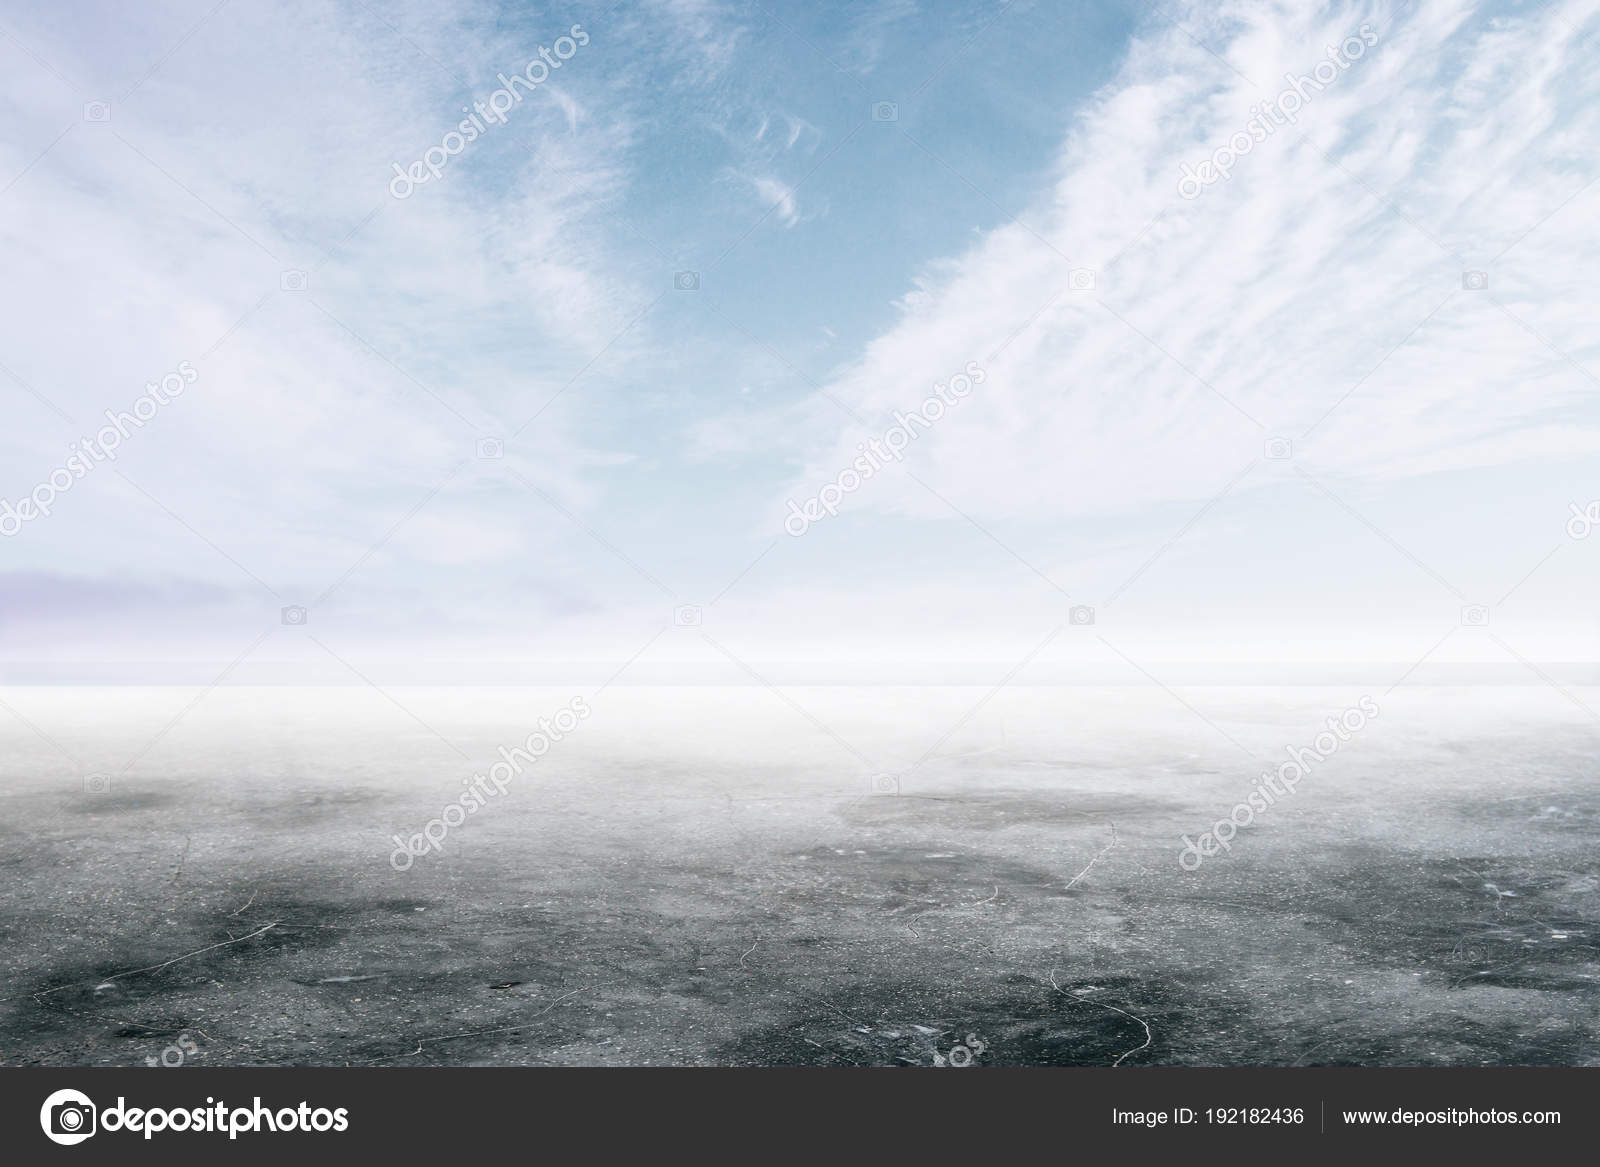 abstract sky and ground background stock photo peshkov 192182436